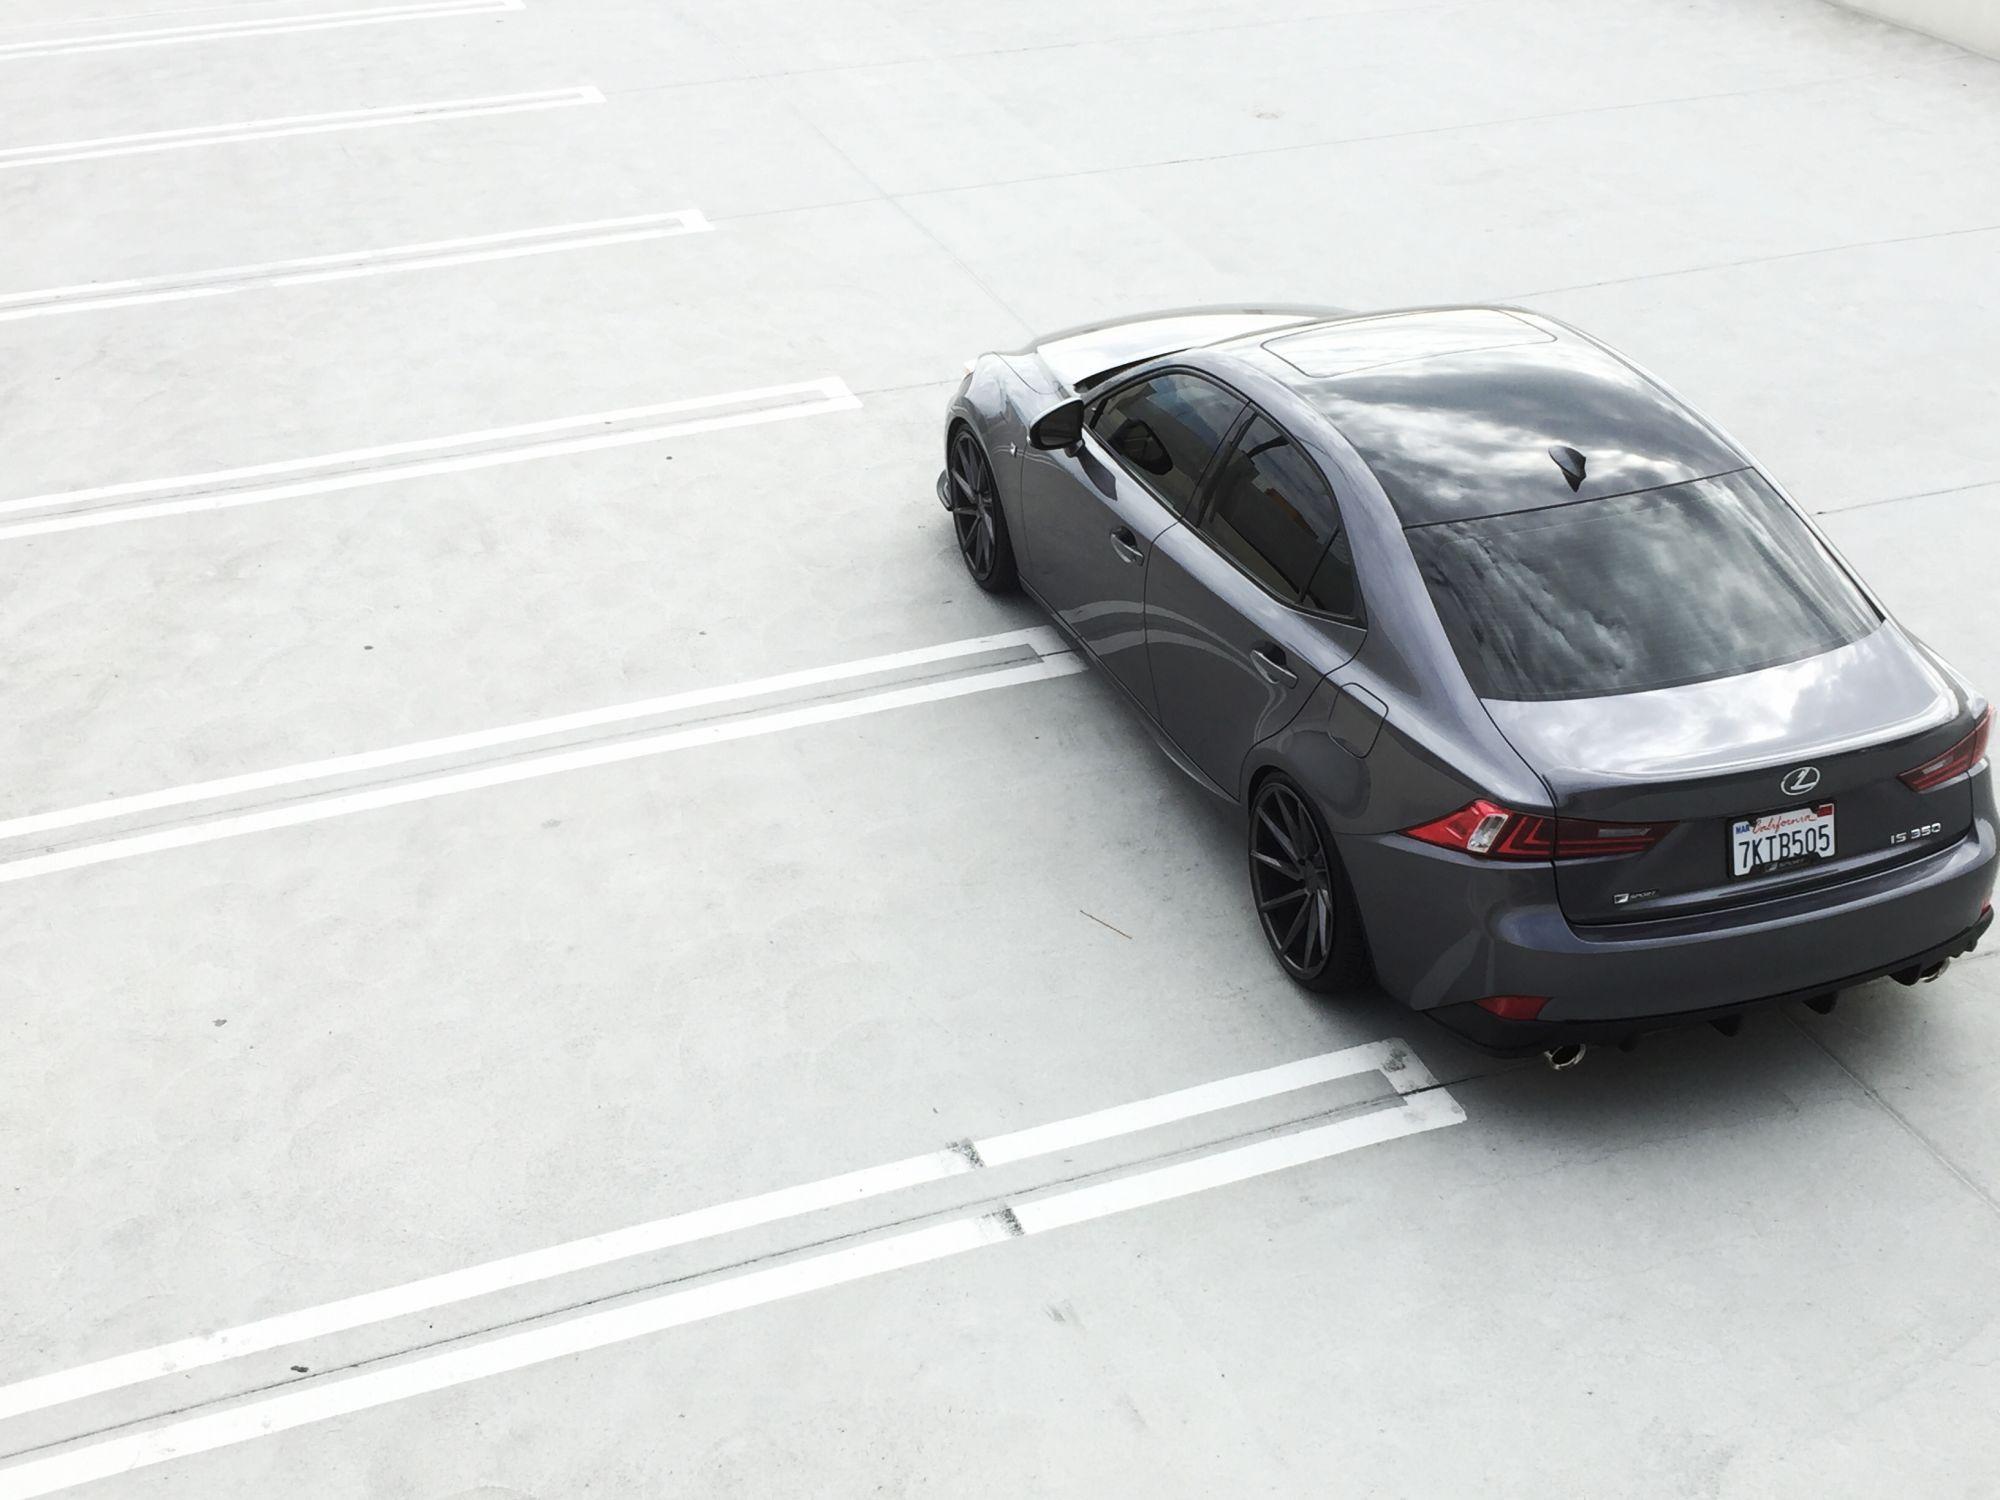 3ISNoName Build - 2015 IS350 F-Sport (Nebula Gray) - Page 2 - Club Lexus Forums